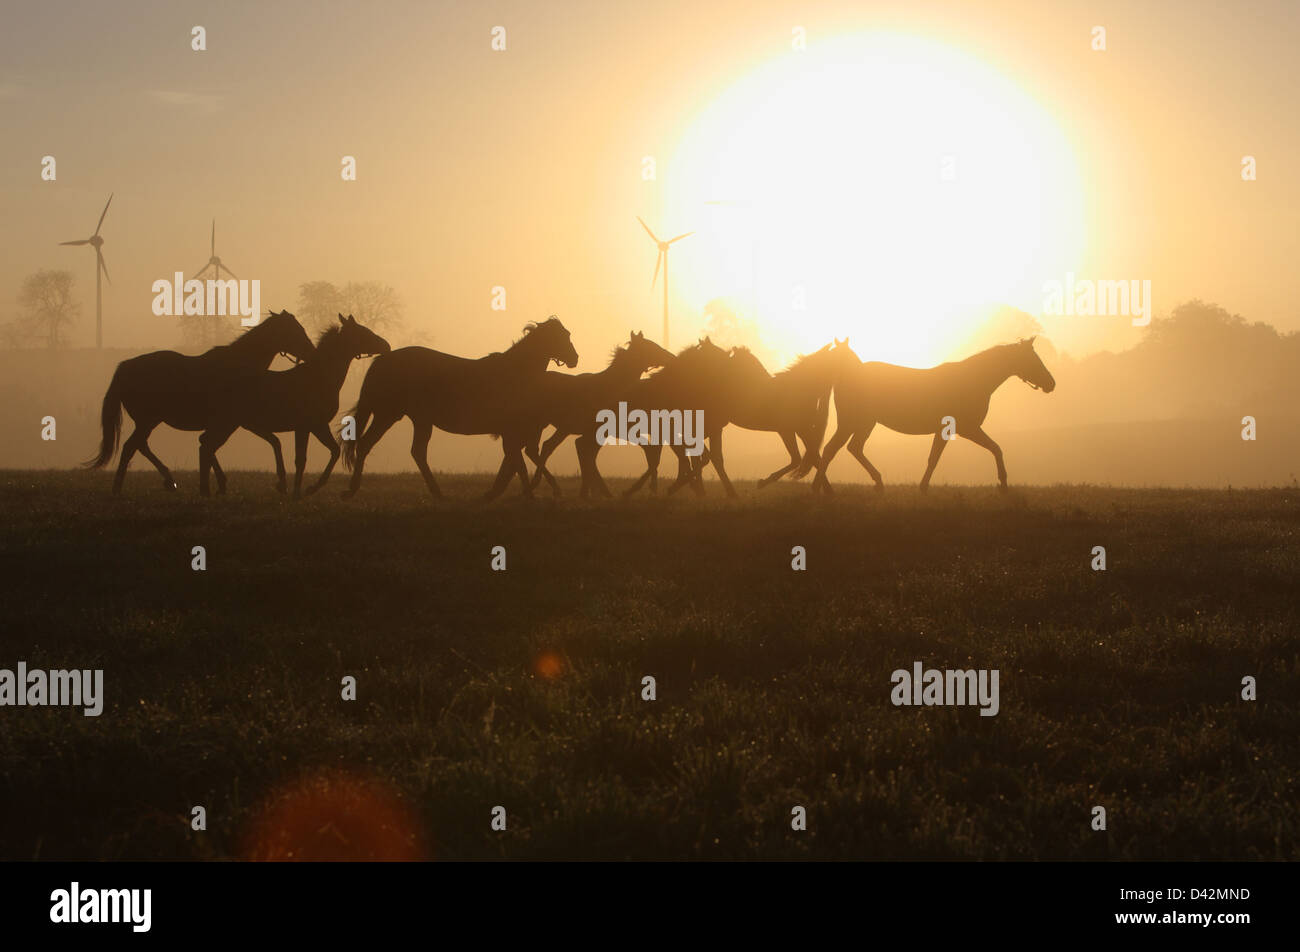 Görlsdorf, Germany, silhouettes of horses trotting at sunrise - Stock Image